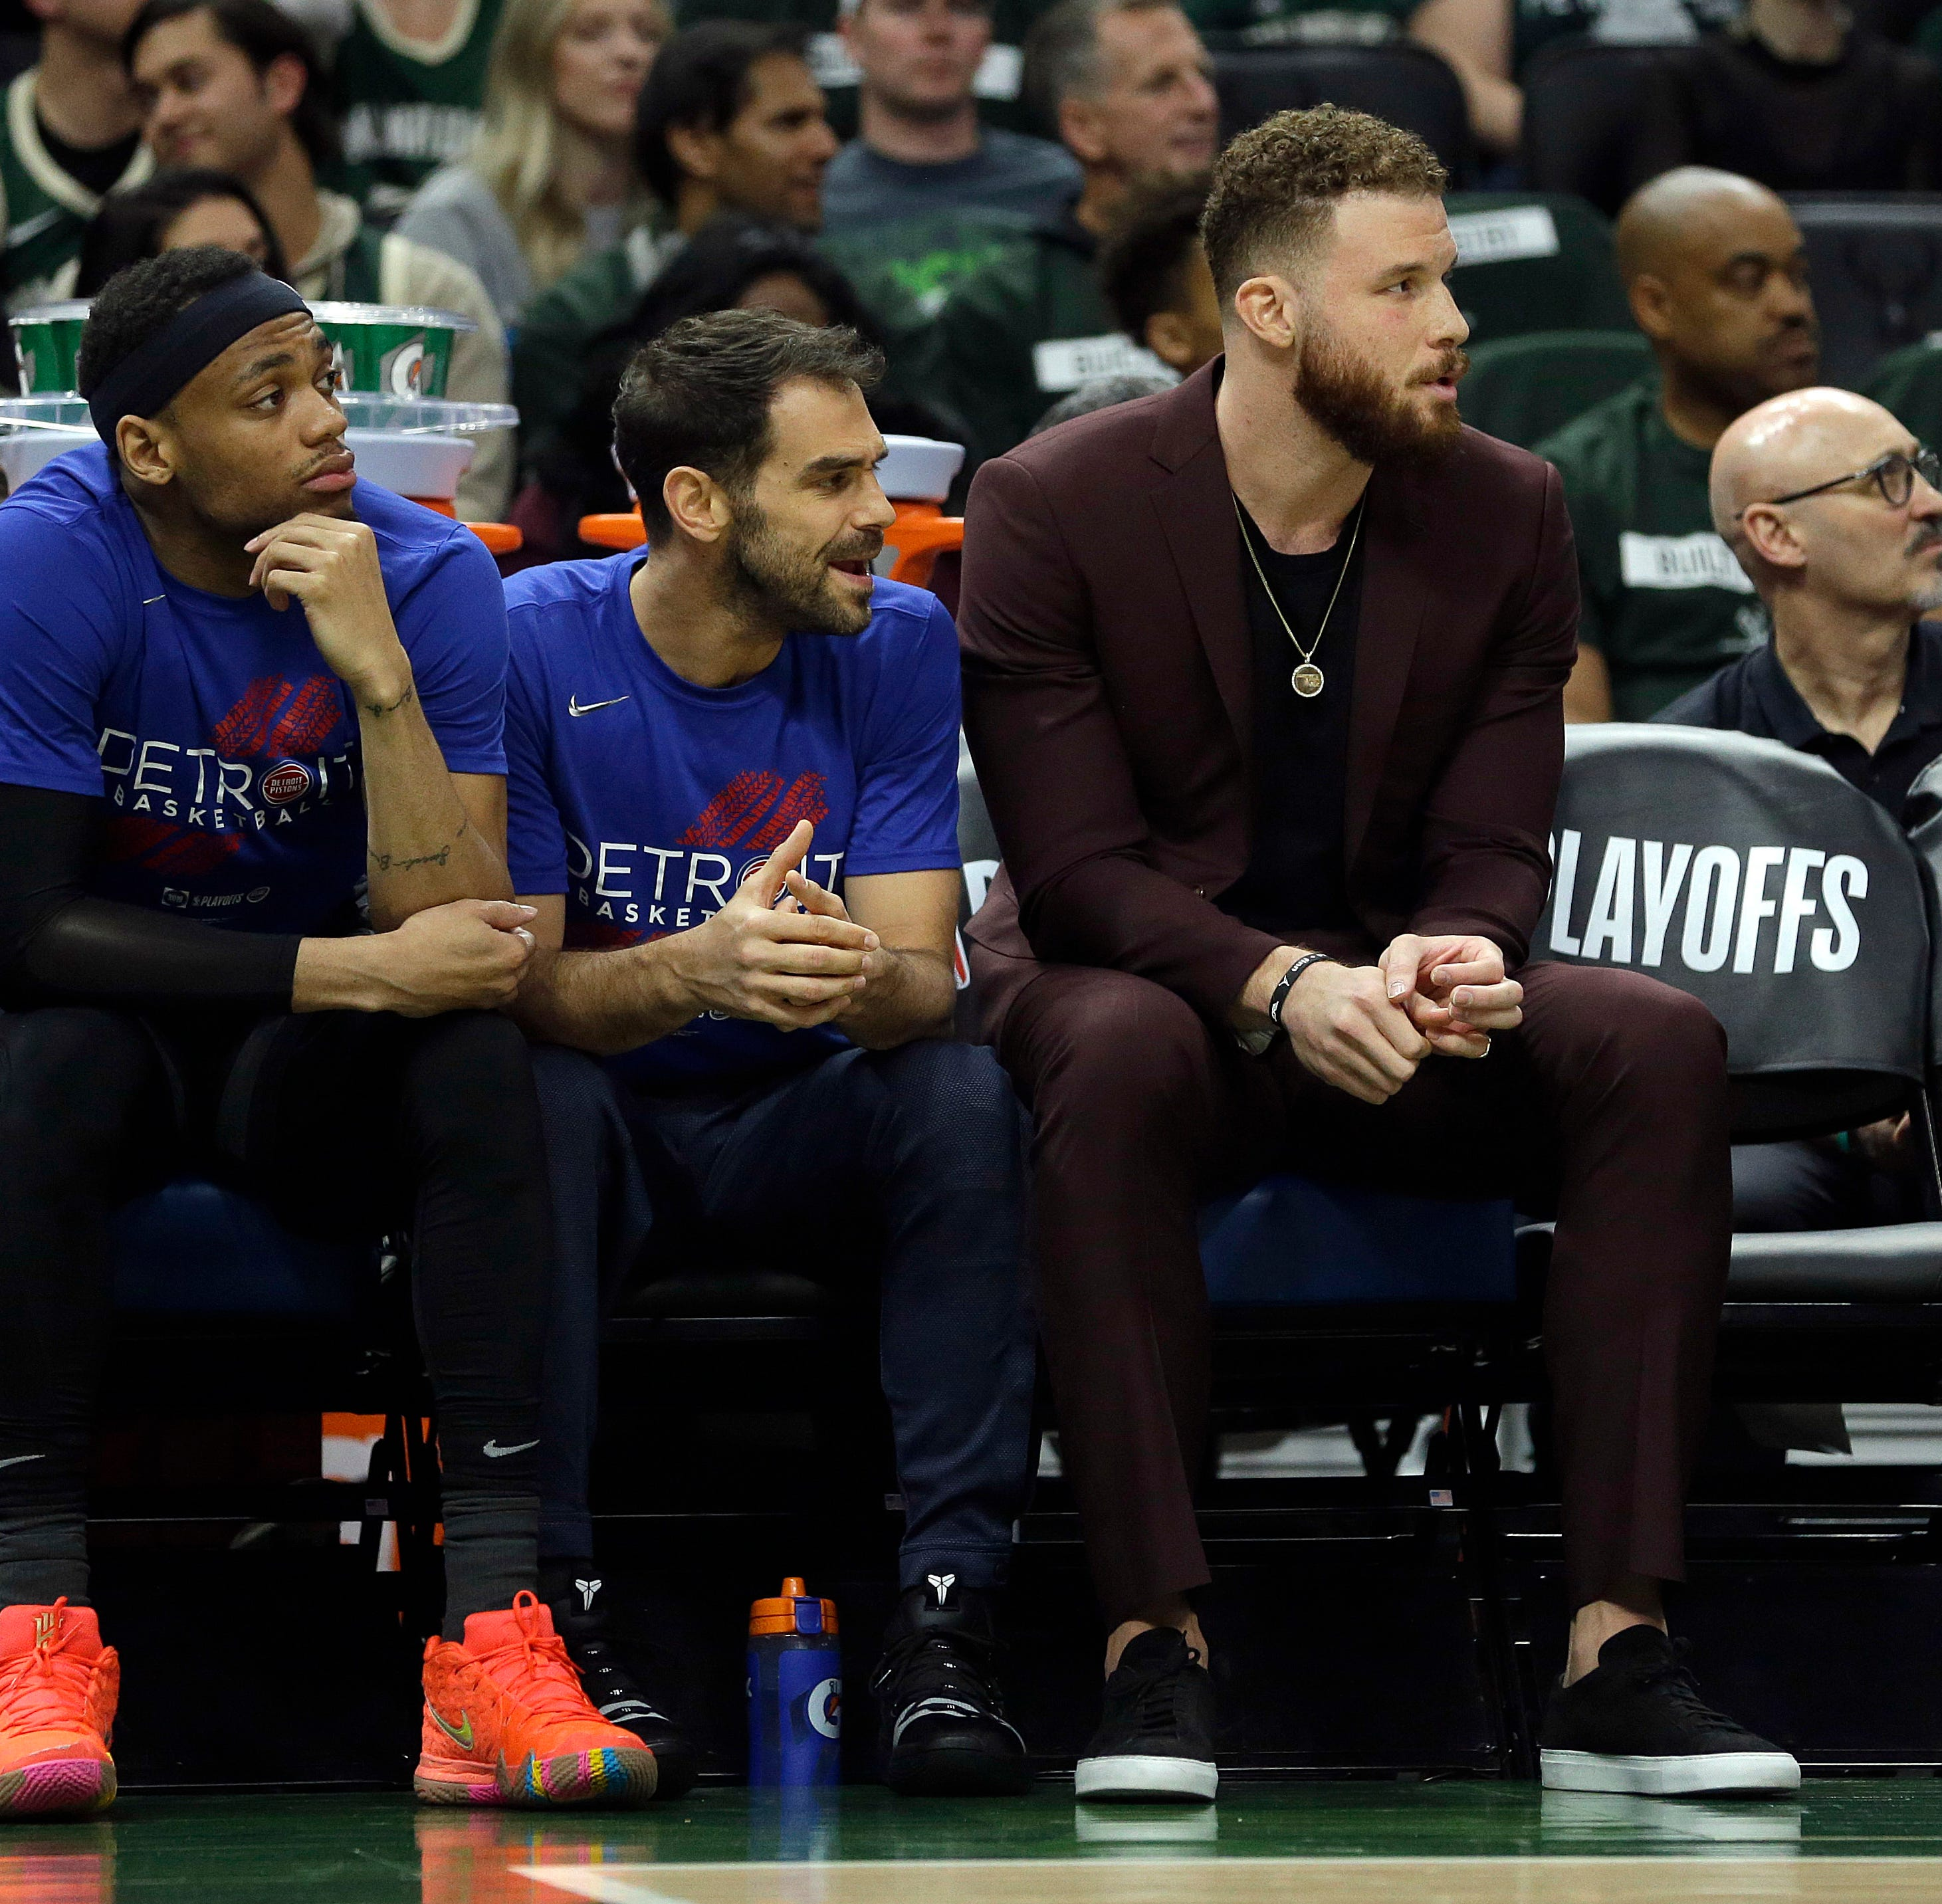 'Very frustrating': Blake Griffin misses opener, return still unclear